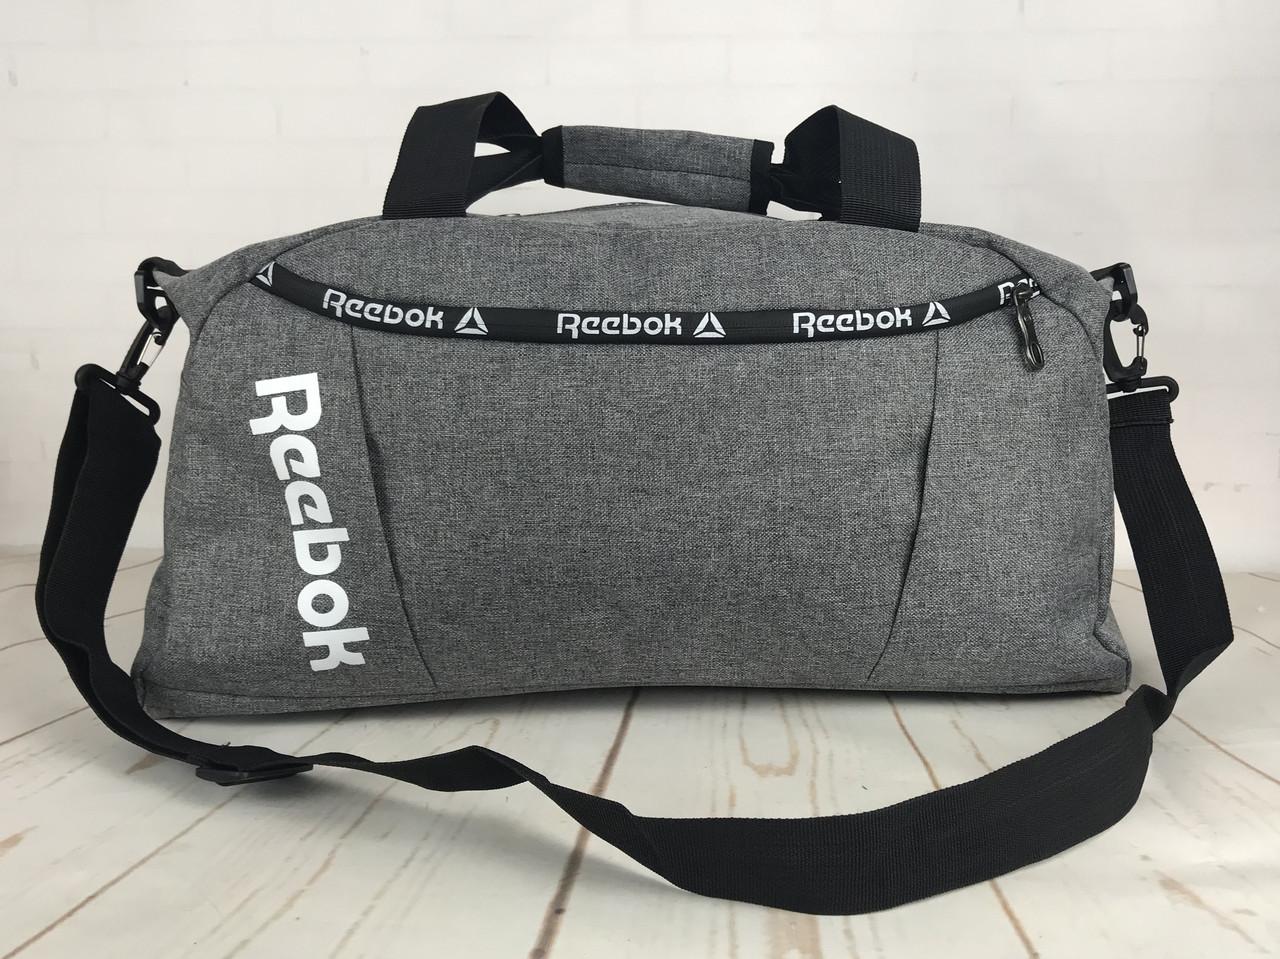 1bfdb5d84fe7 Спортивная сумка Reebok. Дорожная сумка. КСС23-1 - интернет-магазин